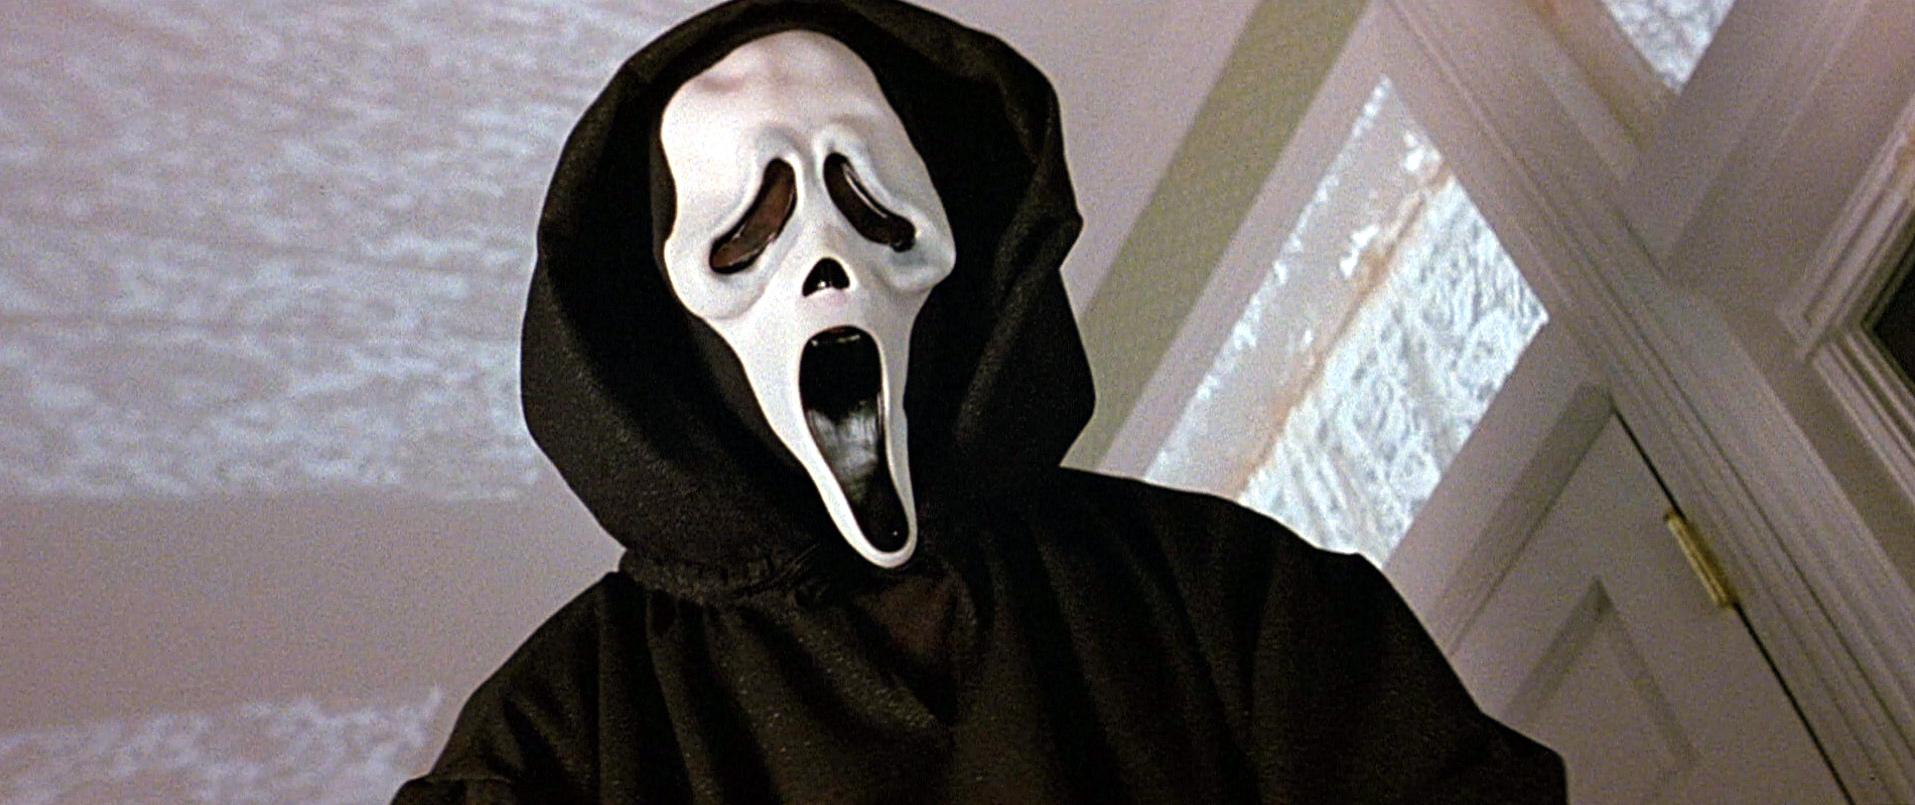 Dane Farwell in Scream (1996)